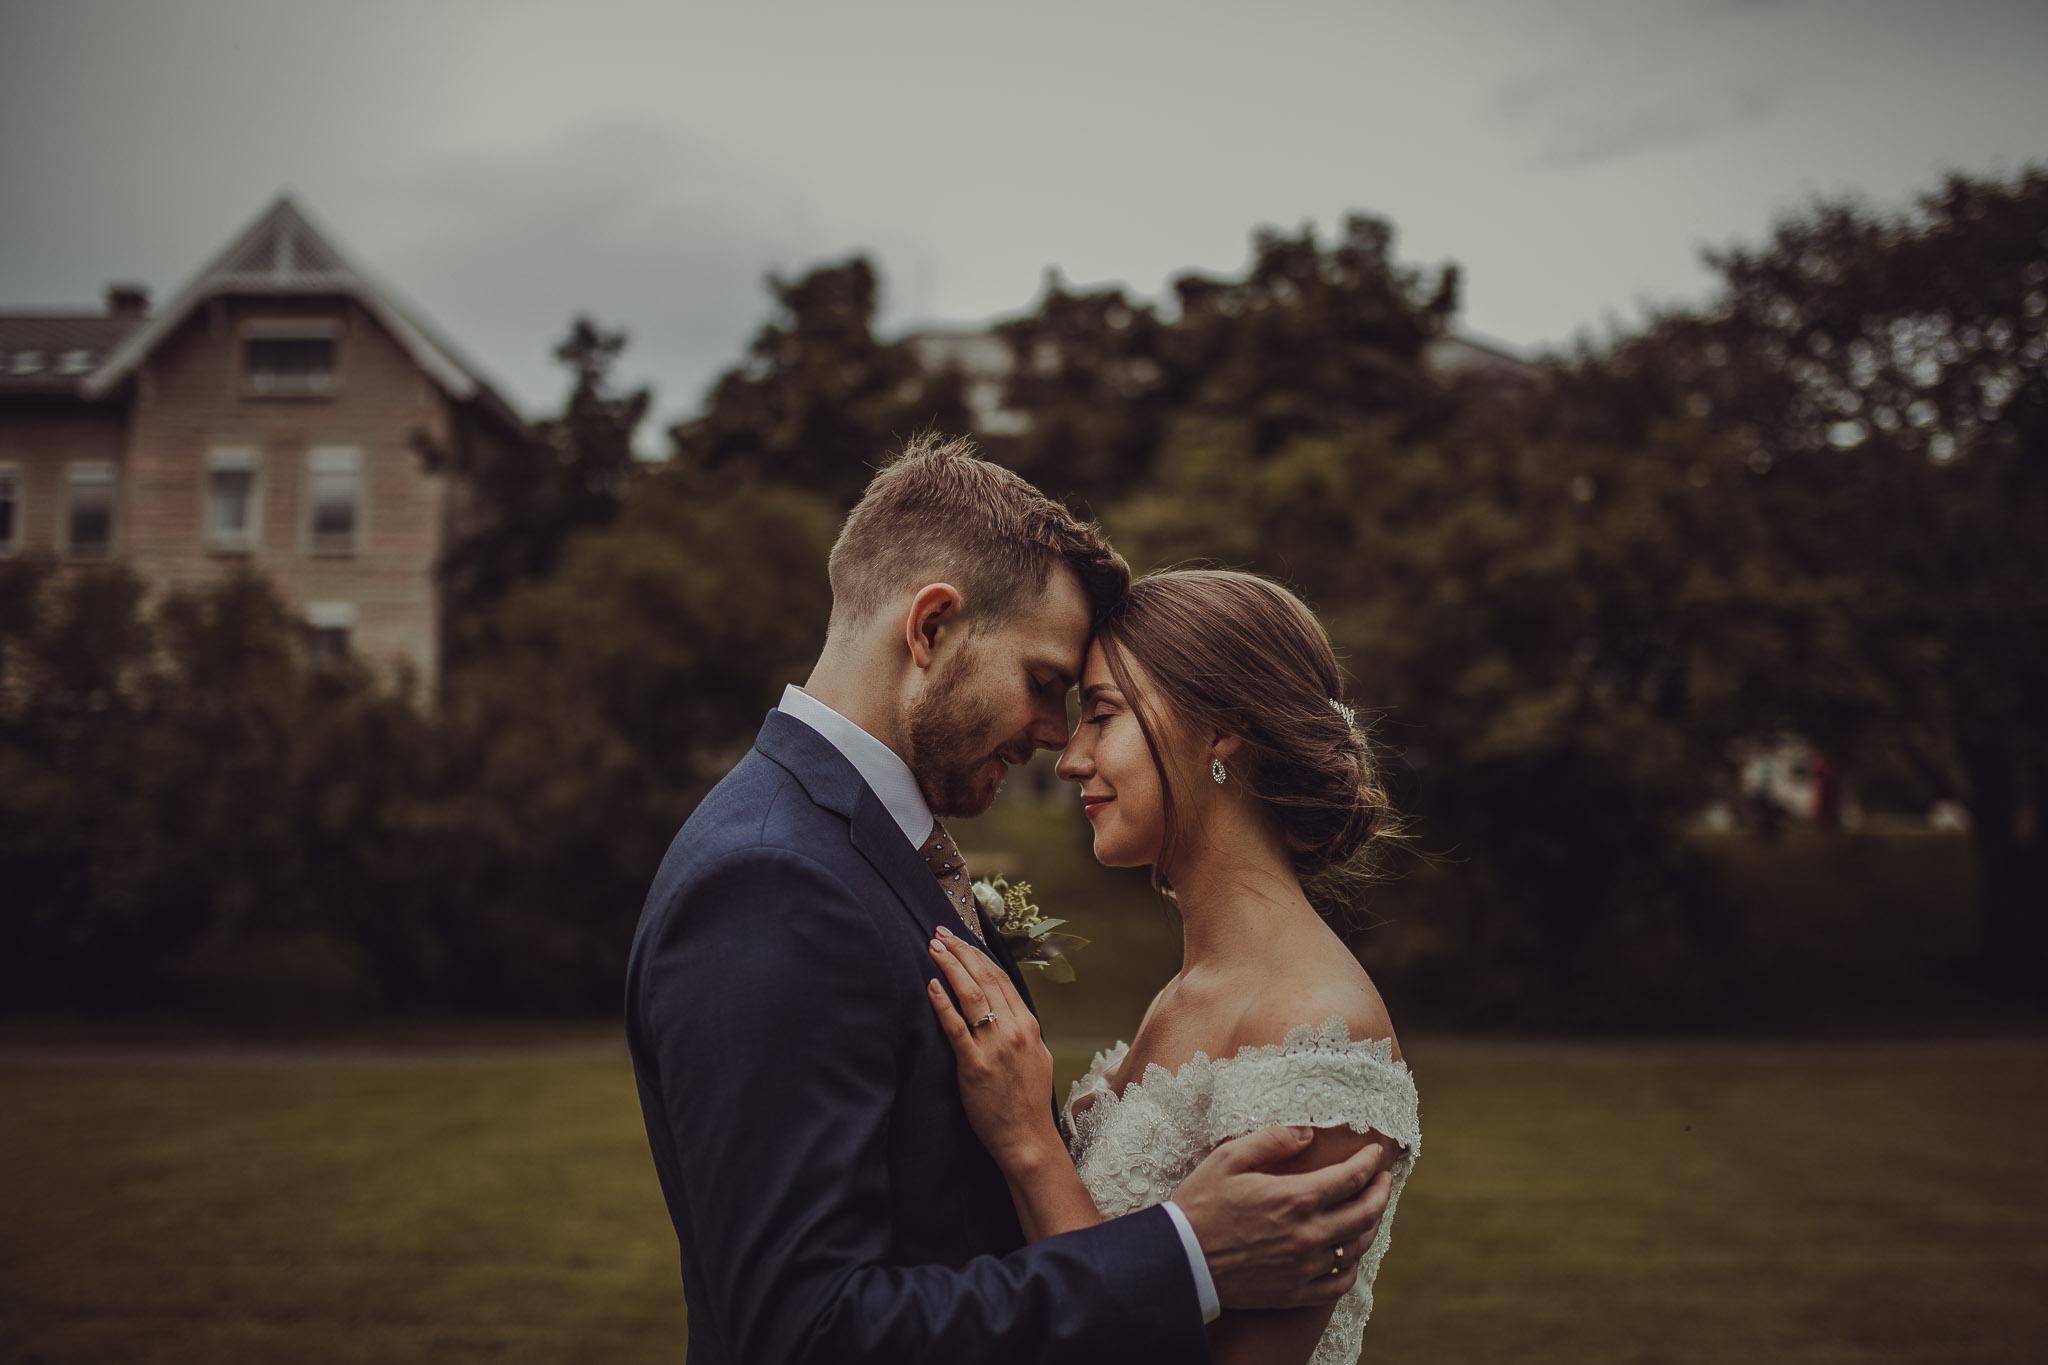 Bryllupsfotografering-bryllup-nps-parken-bodø